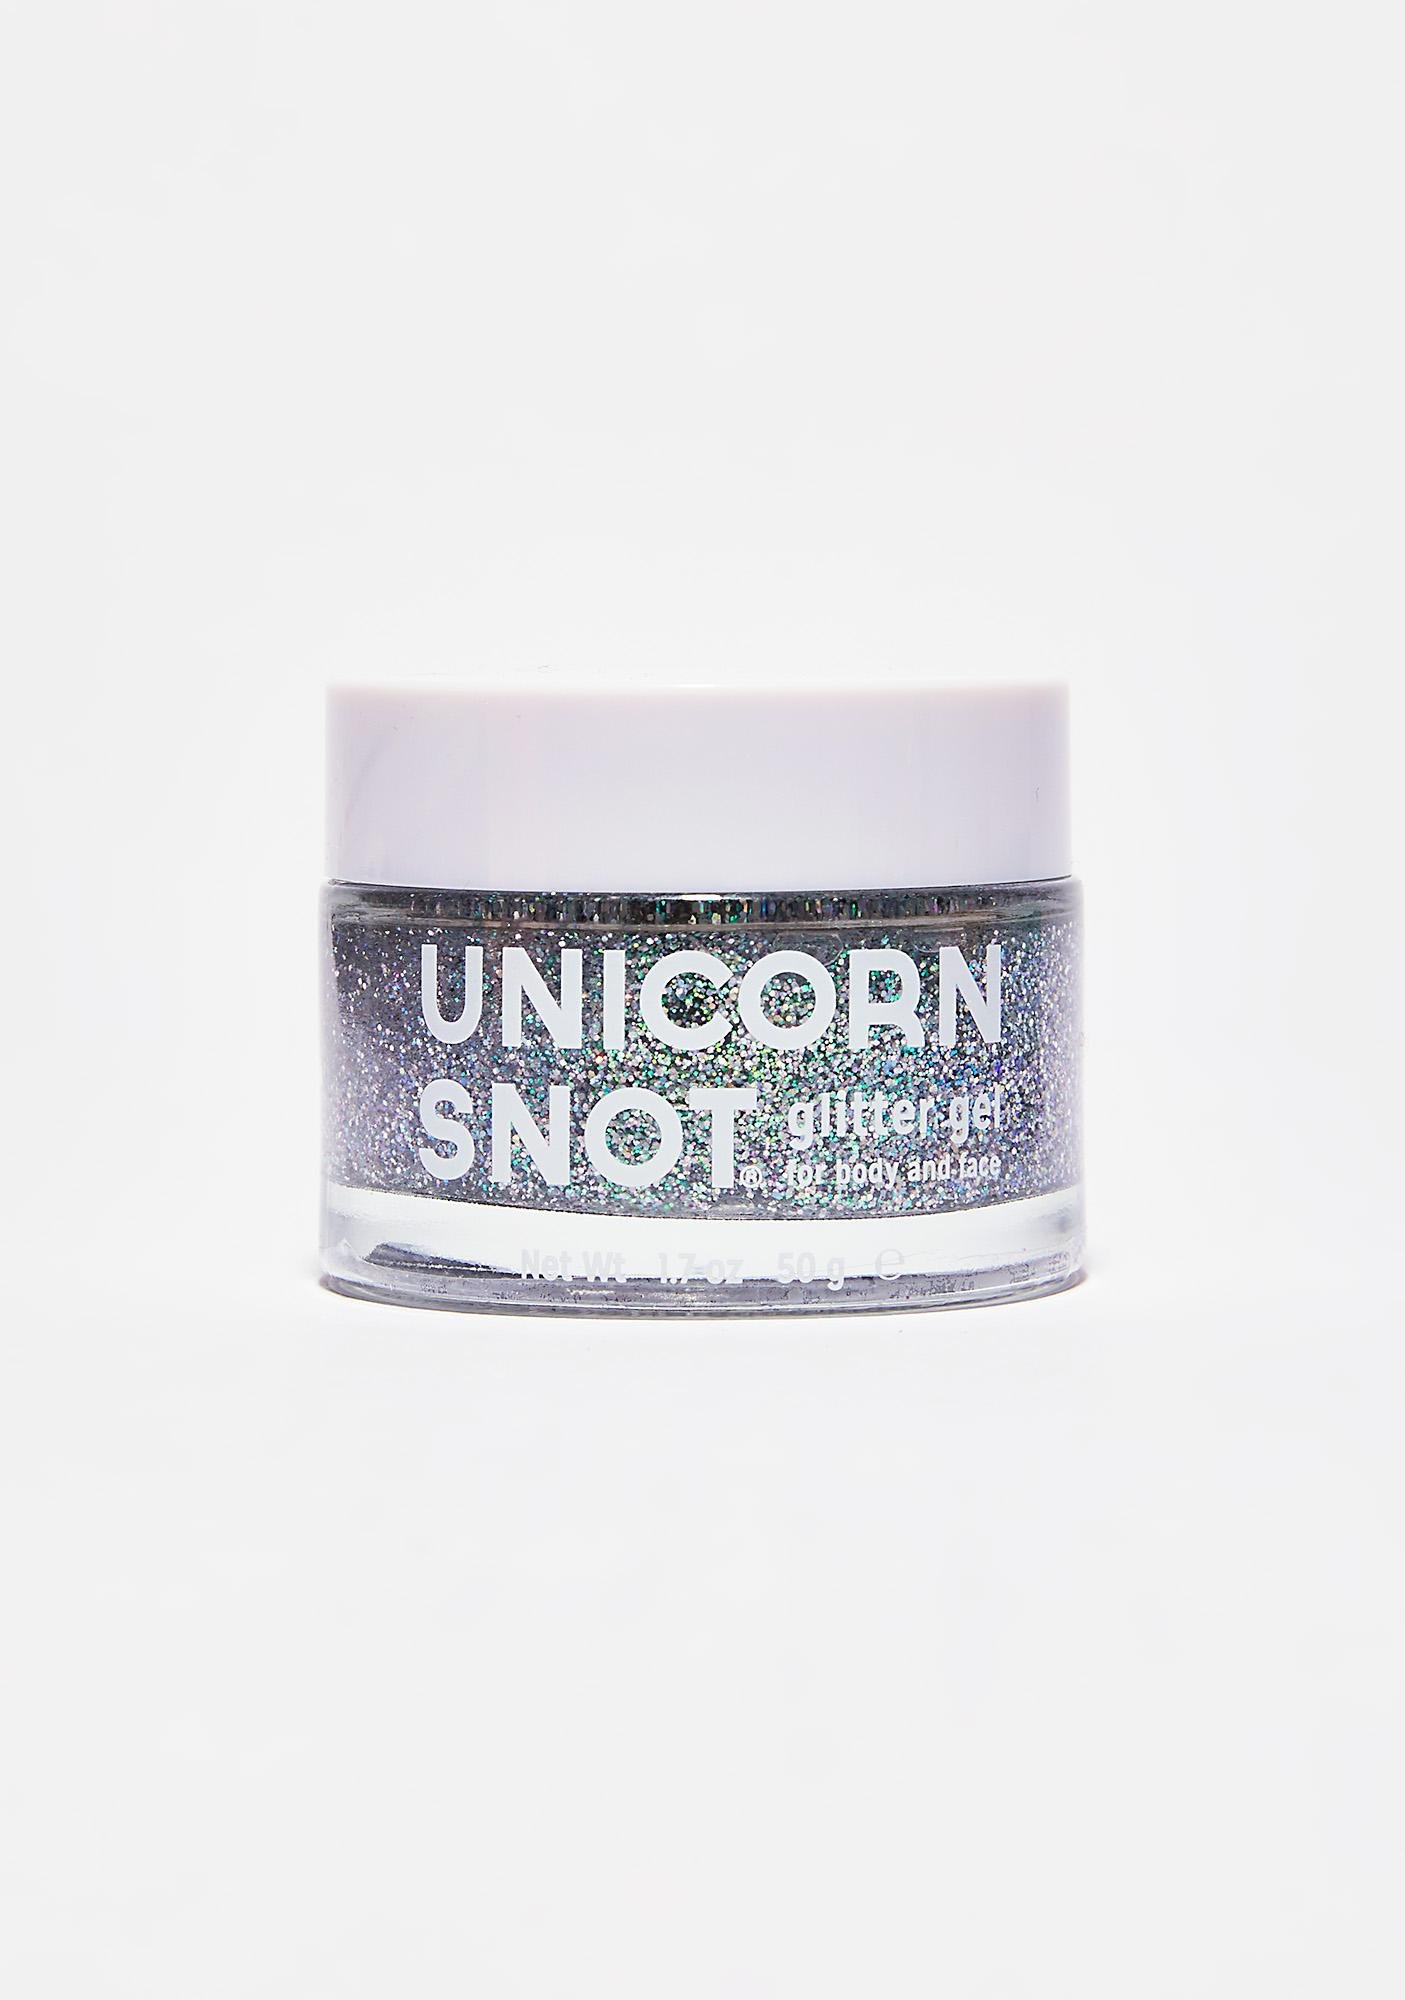 Unicorn Snot Unicorn Snot Silver Glitter Gel